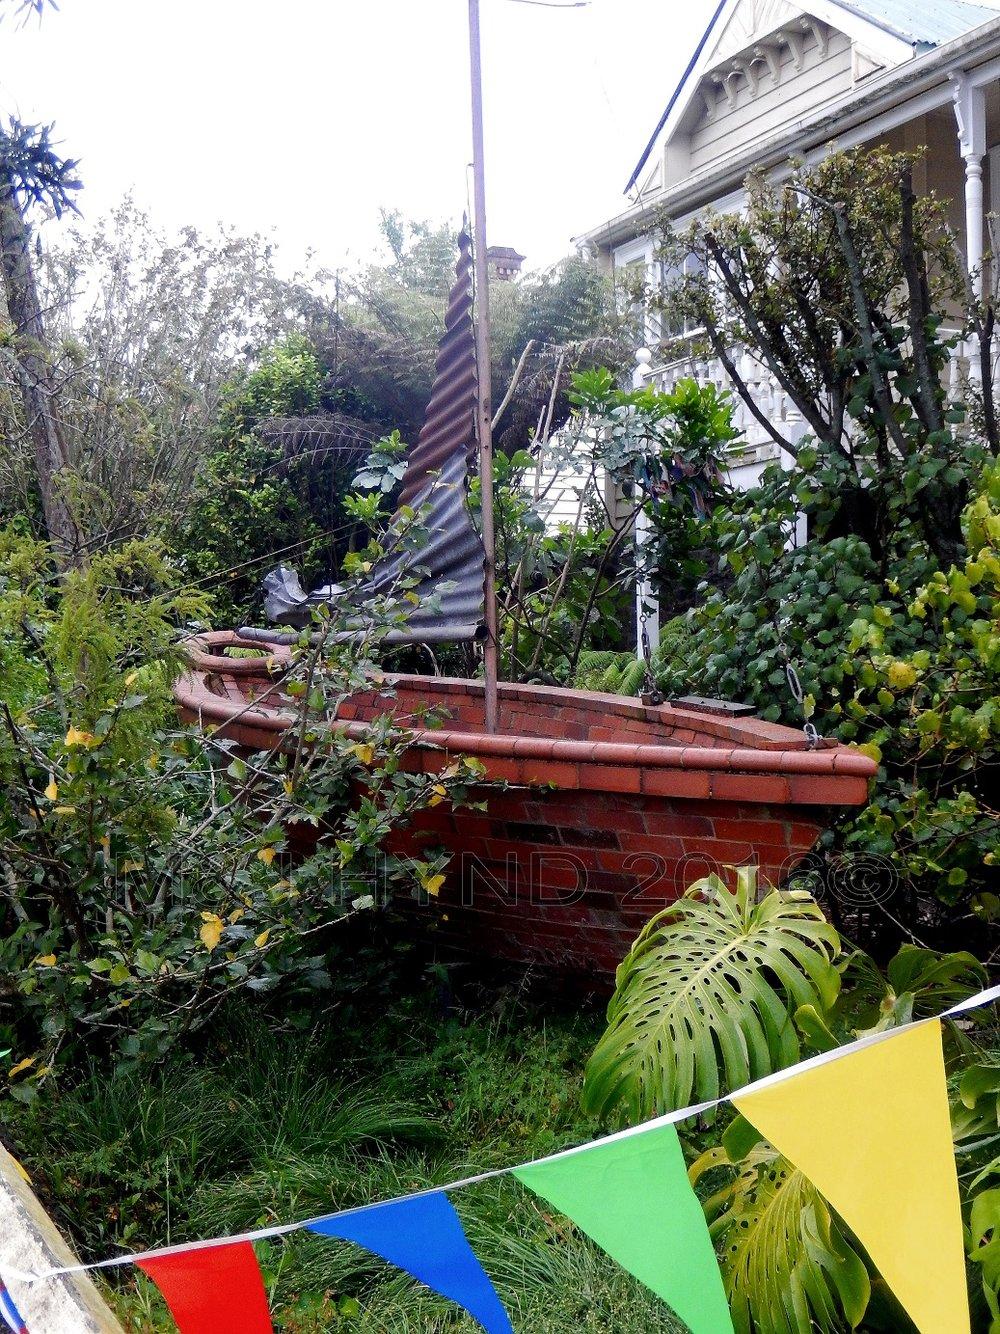 Brick boat, Auckland, NZ